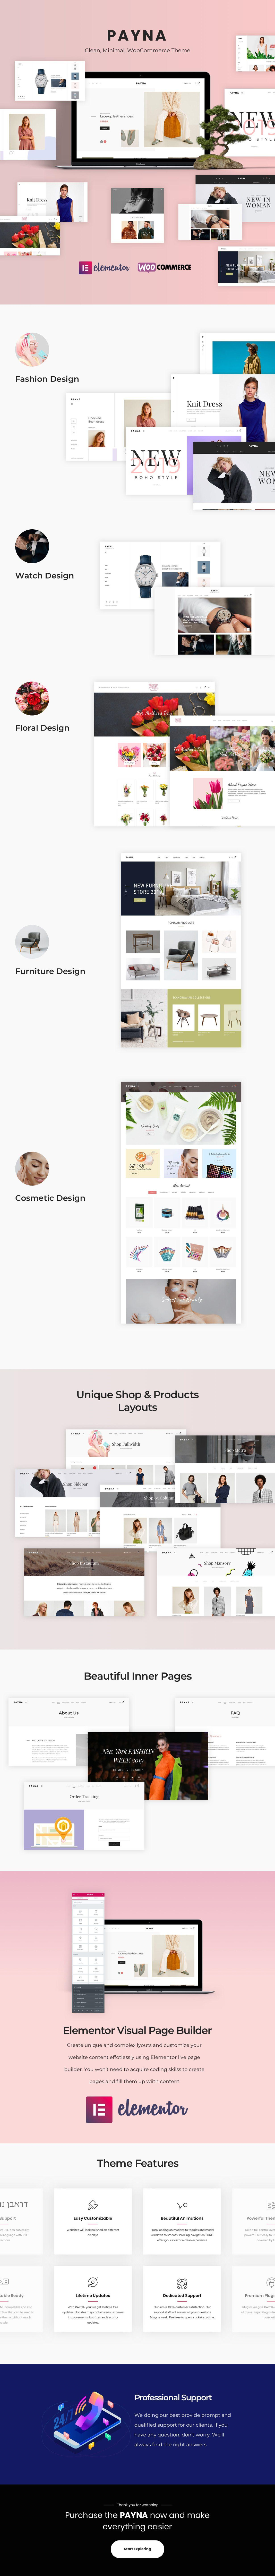 Payna - Clean, Minimal WooCommerce Theme - 2